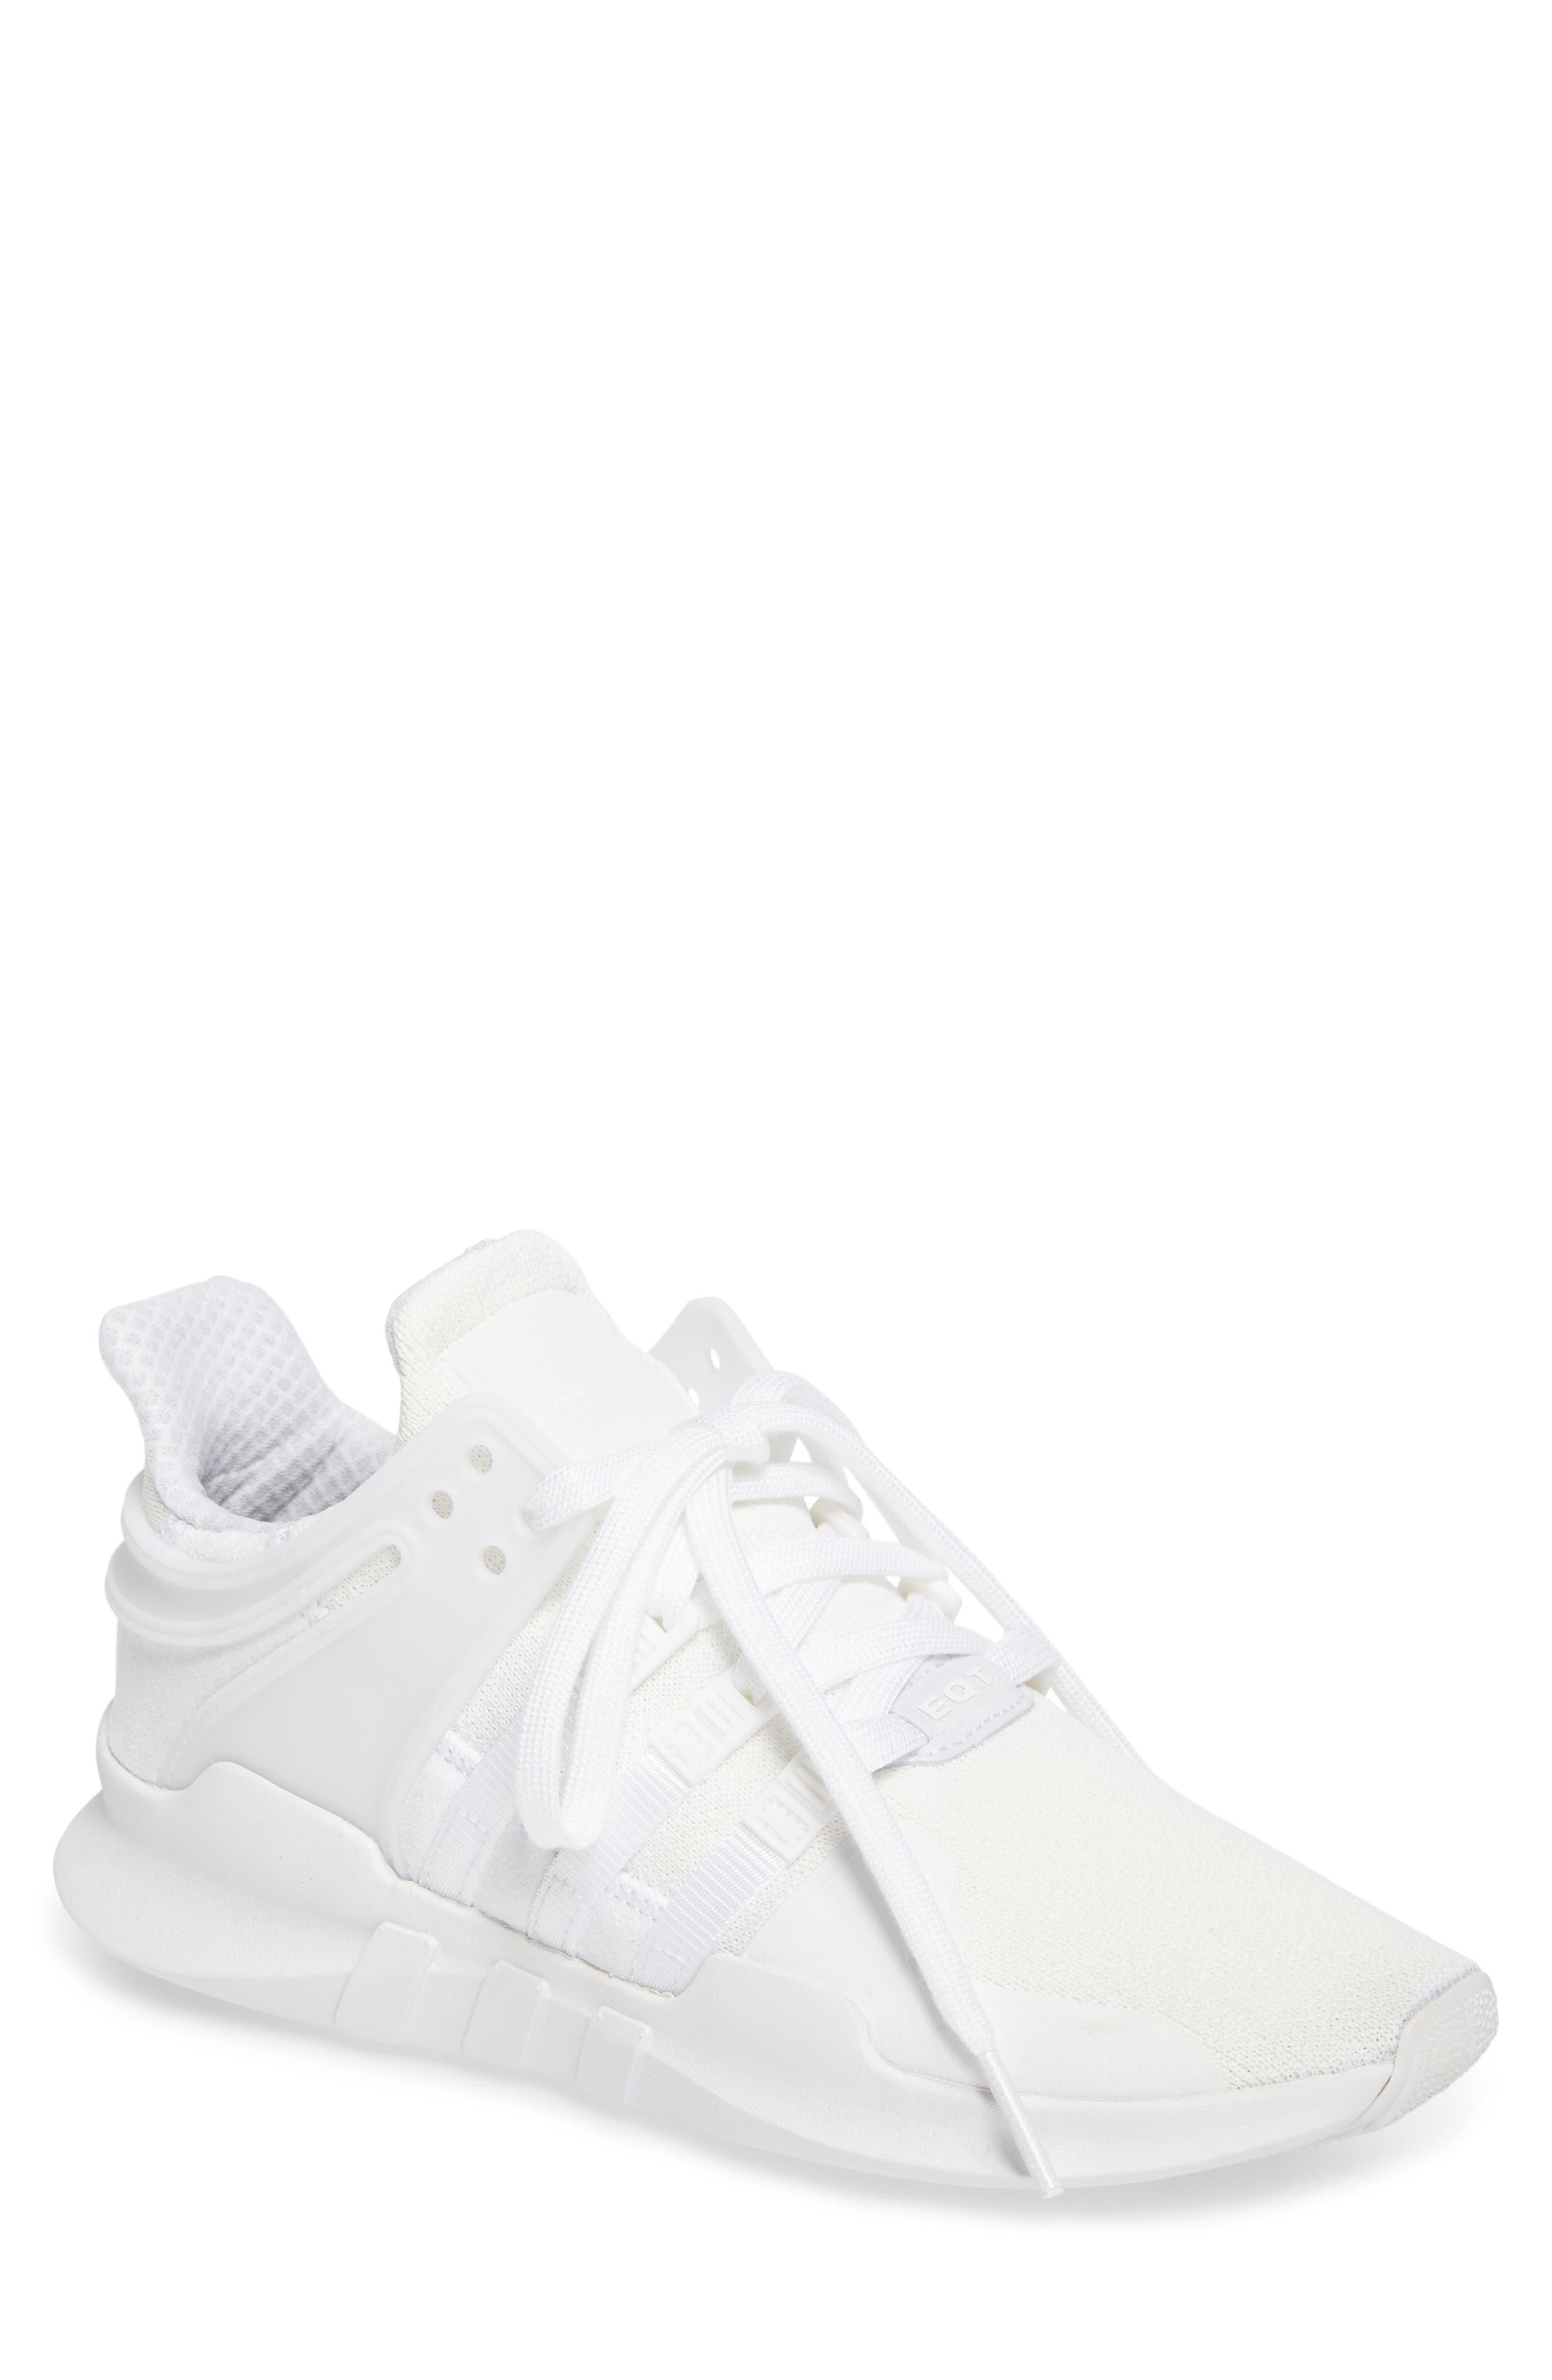 EQT Support Adv Sneaker,                             Main thumbnail 1, color,                             White/Core Black